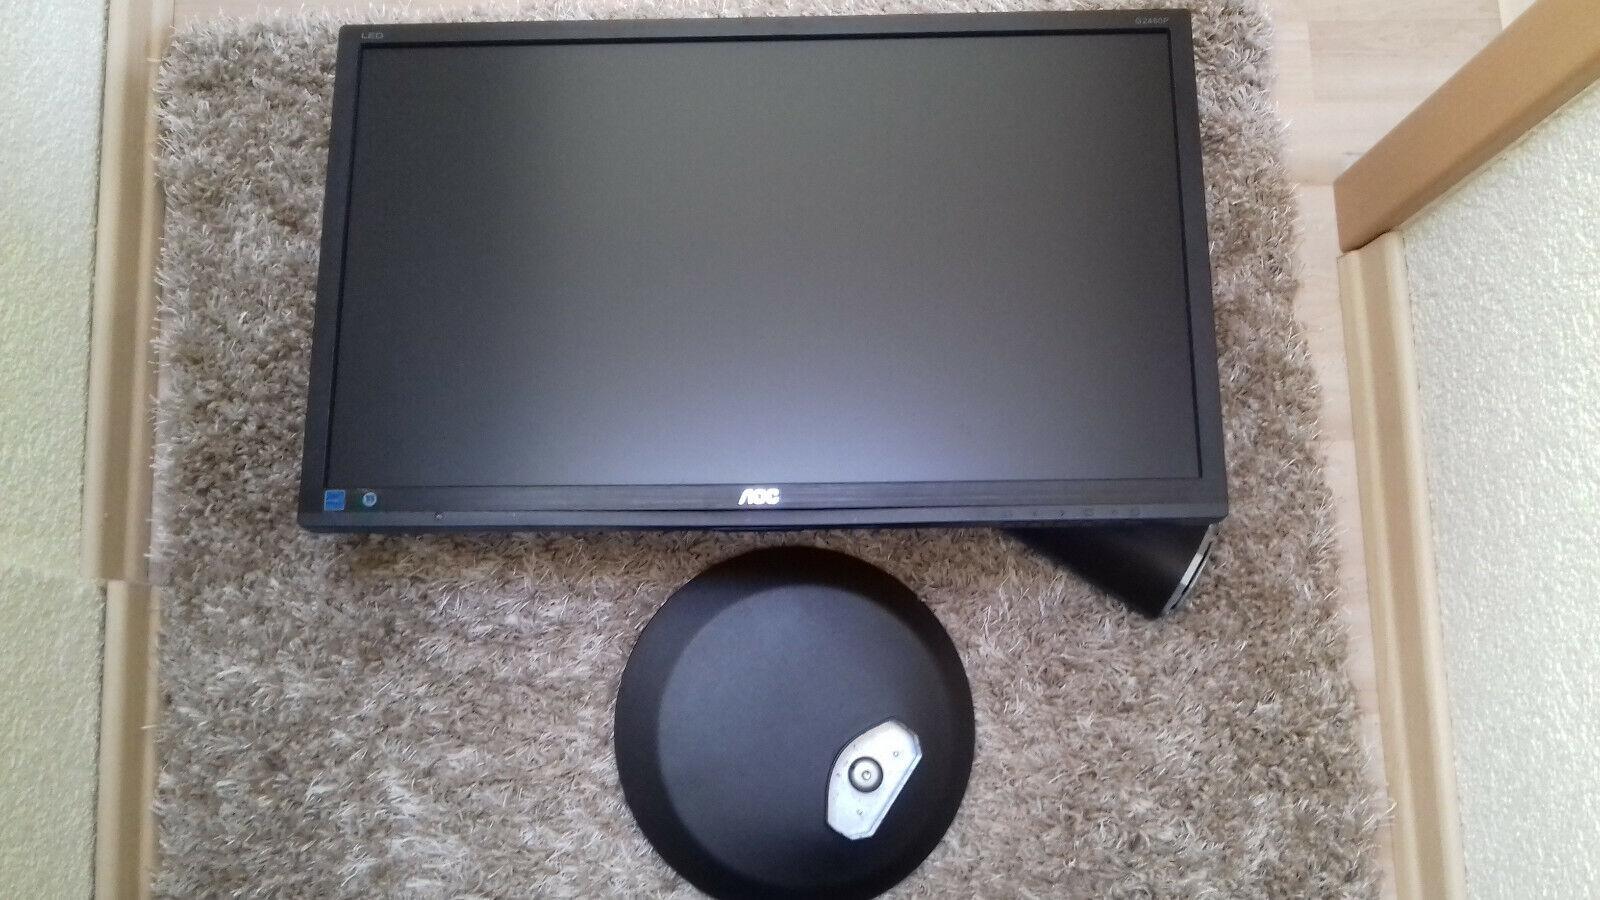 AOC G2460PQU 60,9 cm (24 Zoll) Monitor (VGA, DVI, HDMI, Display Port, 1ms Reakti